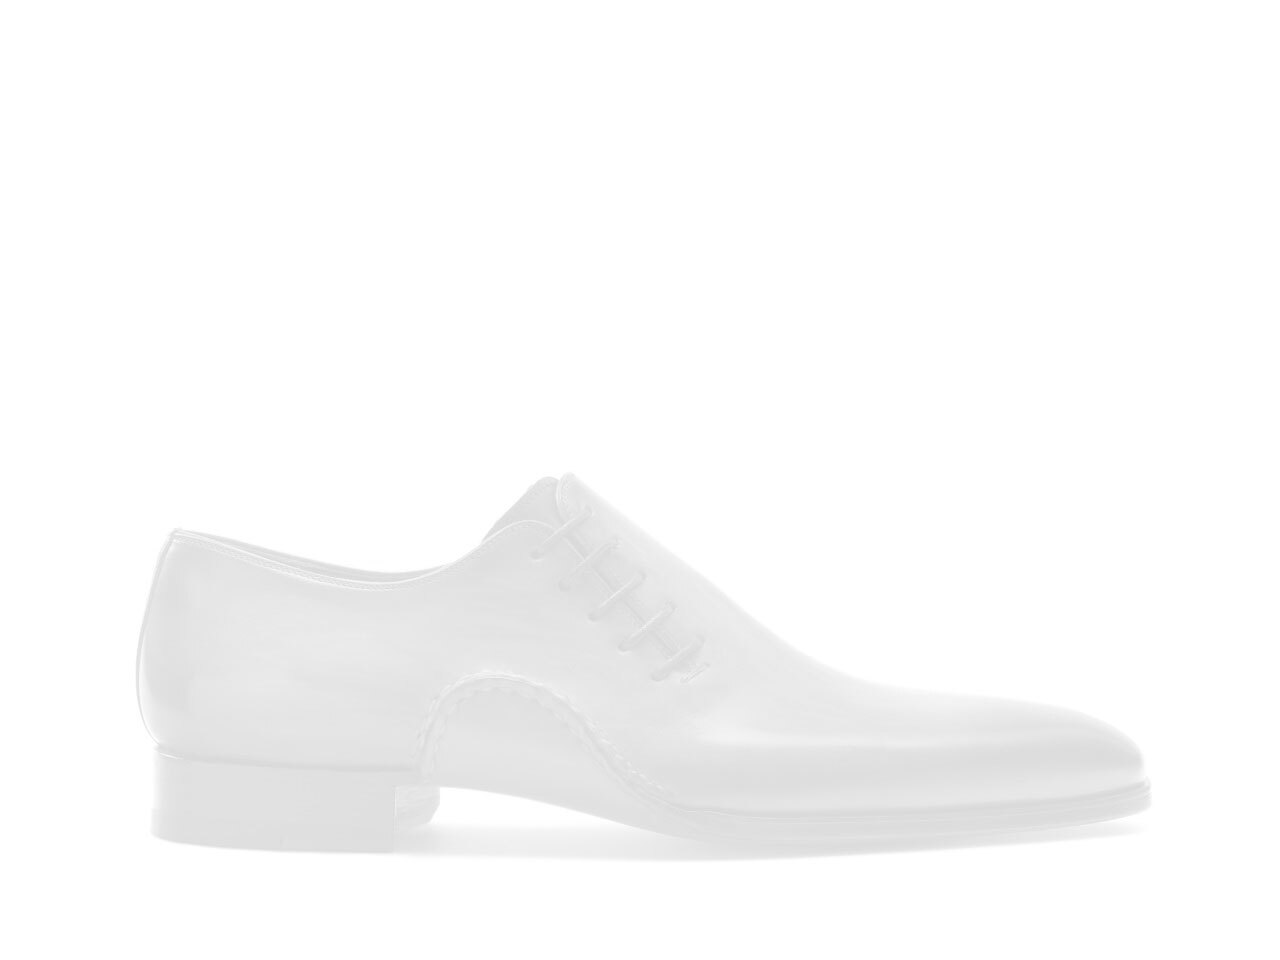 Pair of the Magnanni Jude Cognac Men's Oxford Shoes